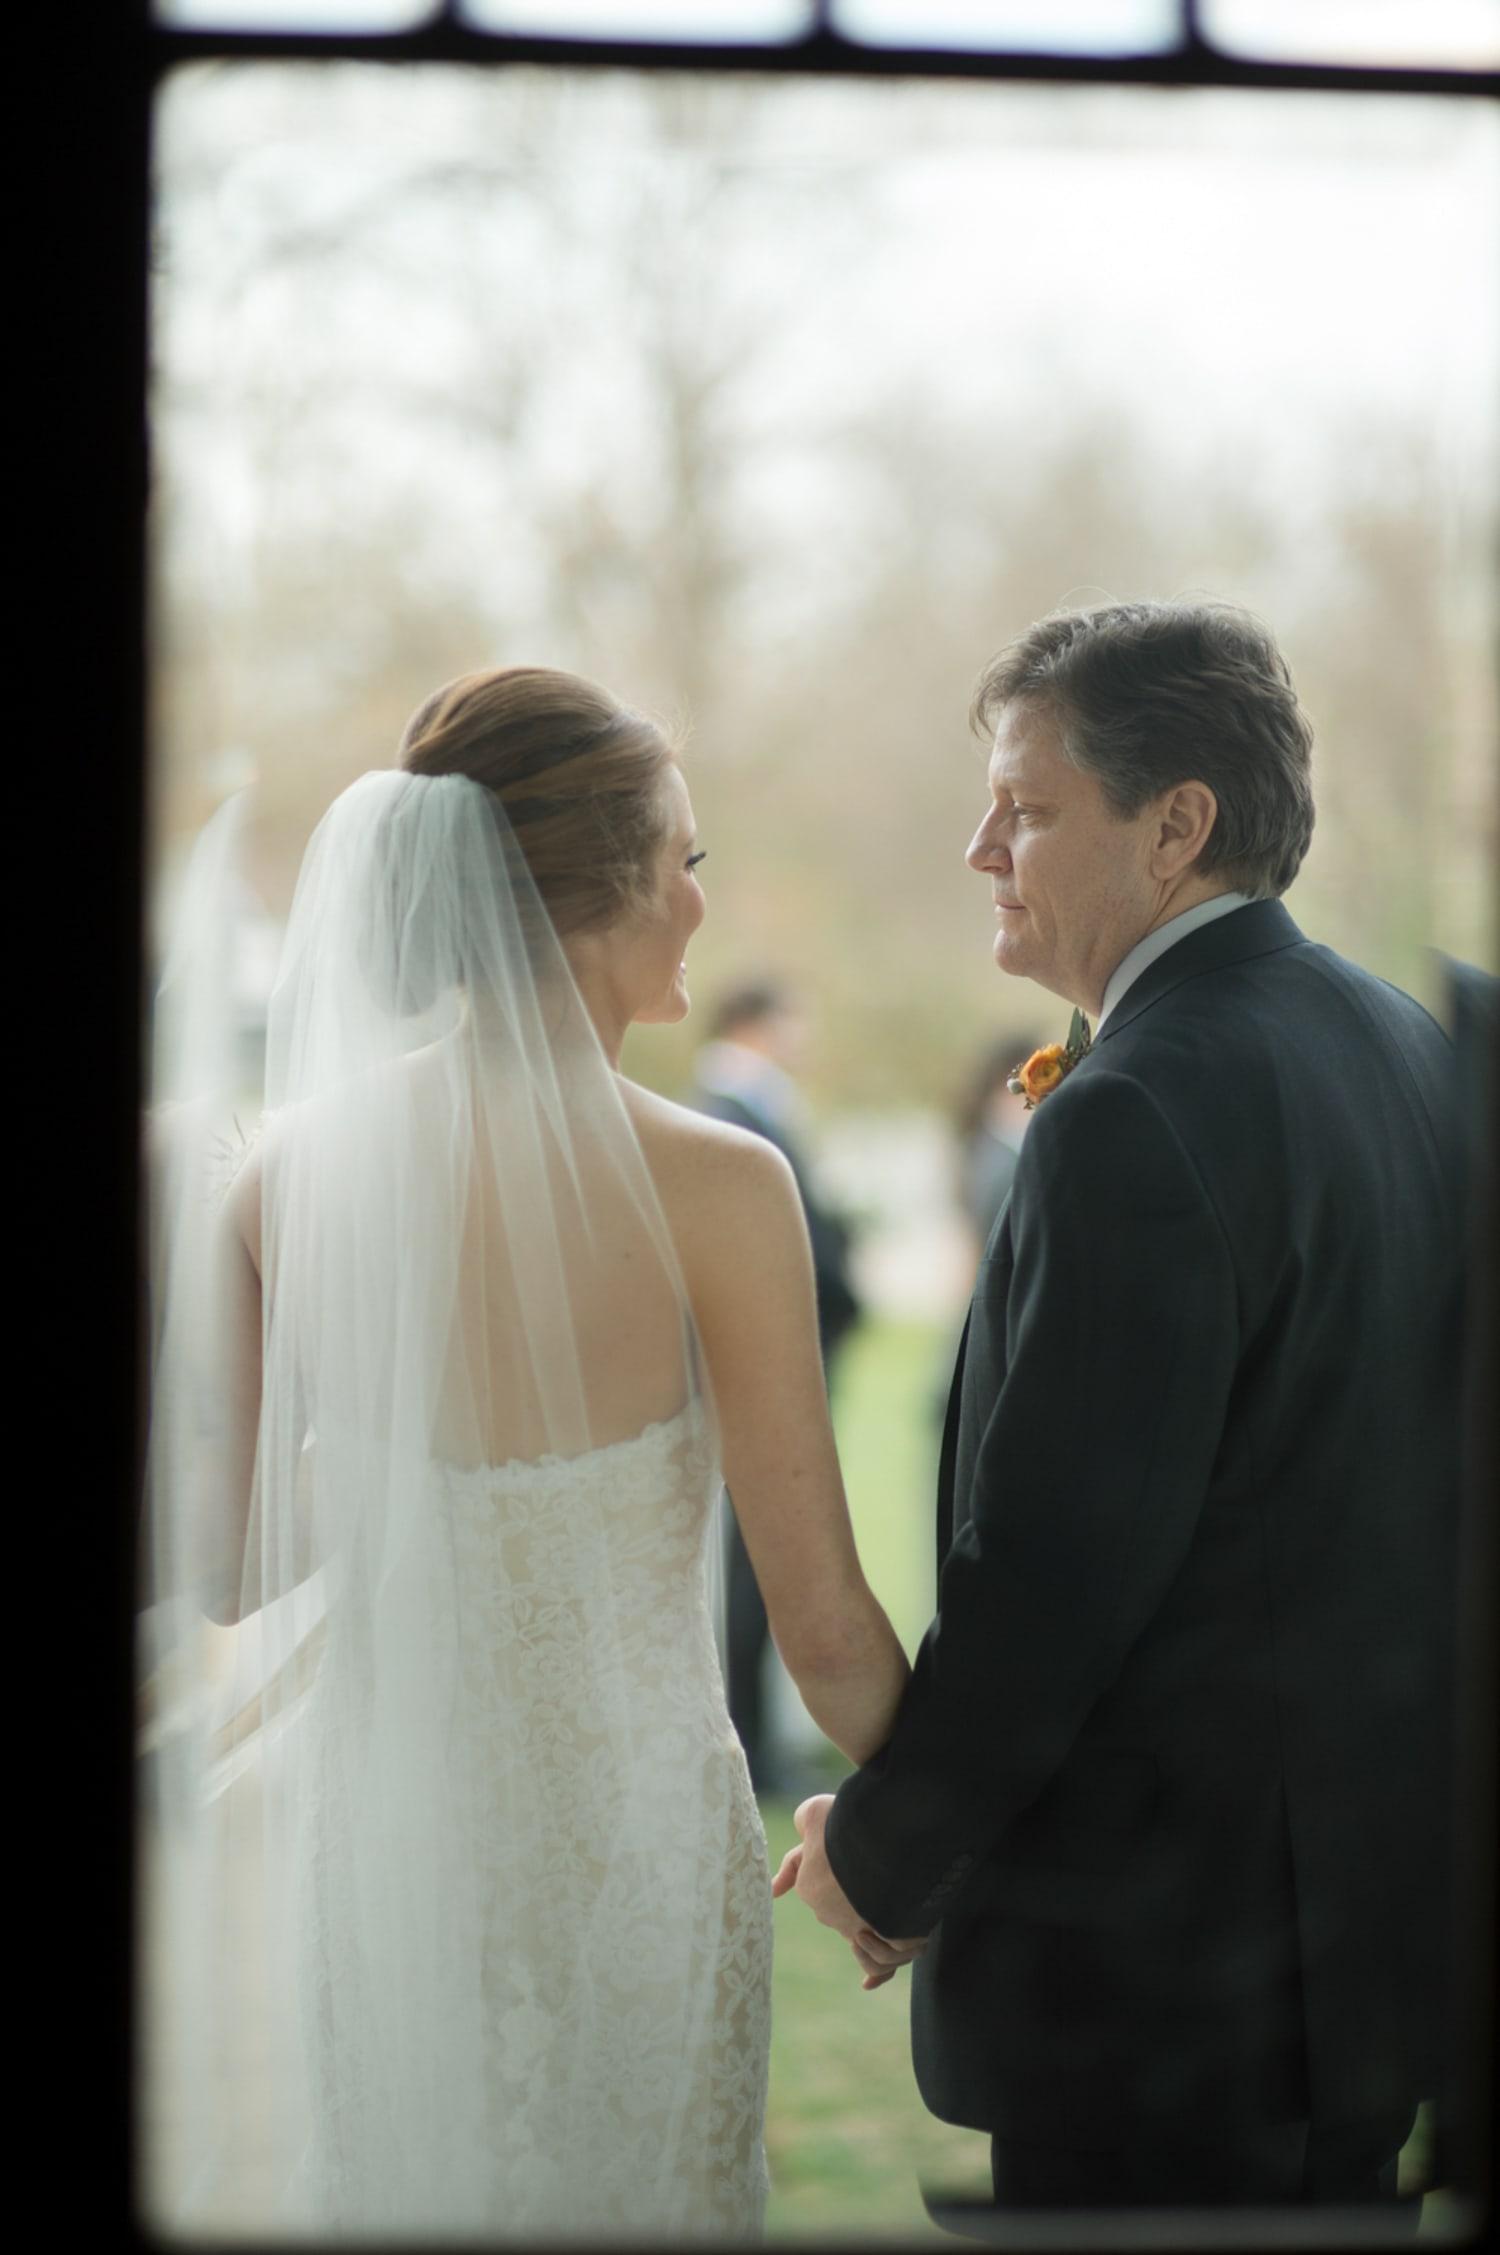 barr-mansion-wedding-20.jpg